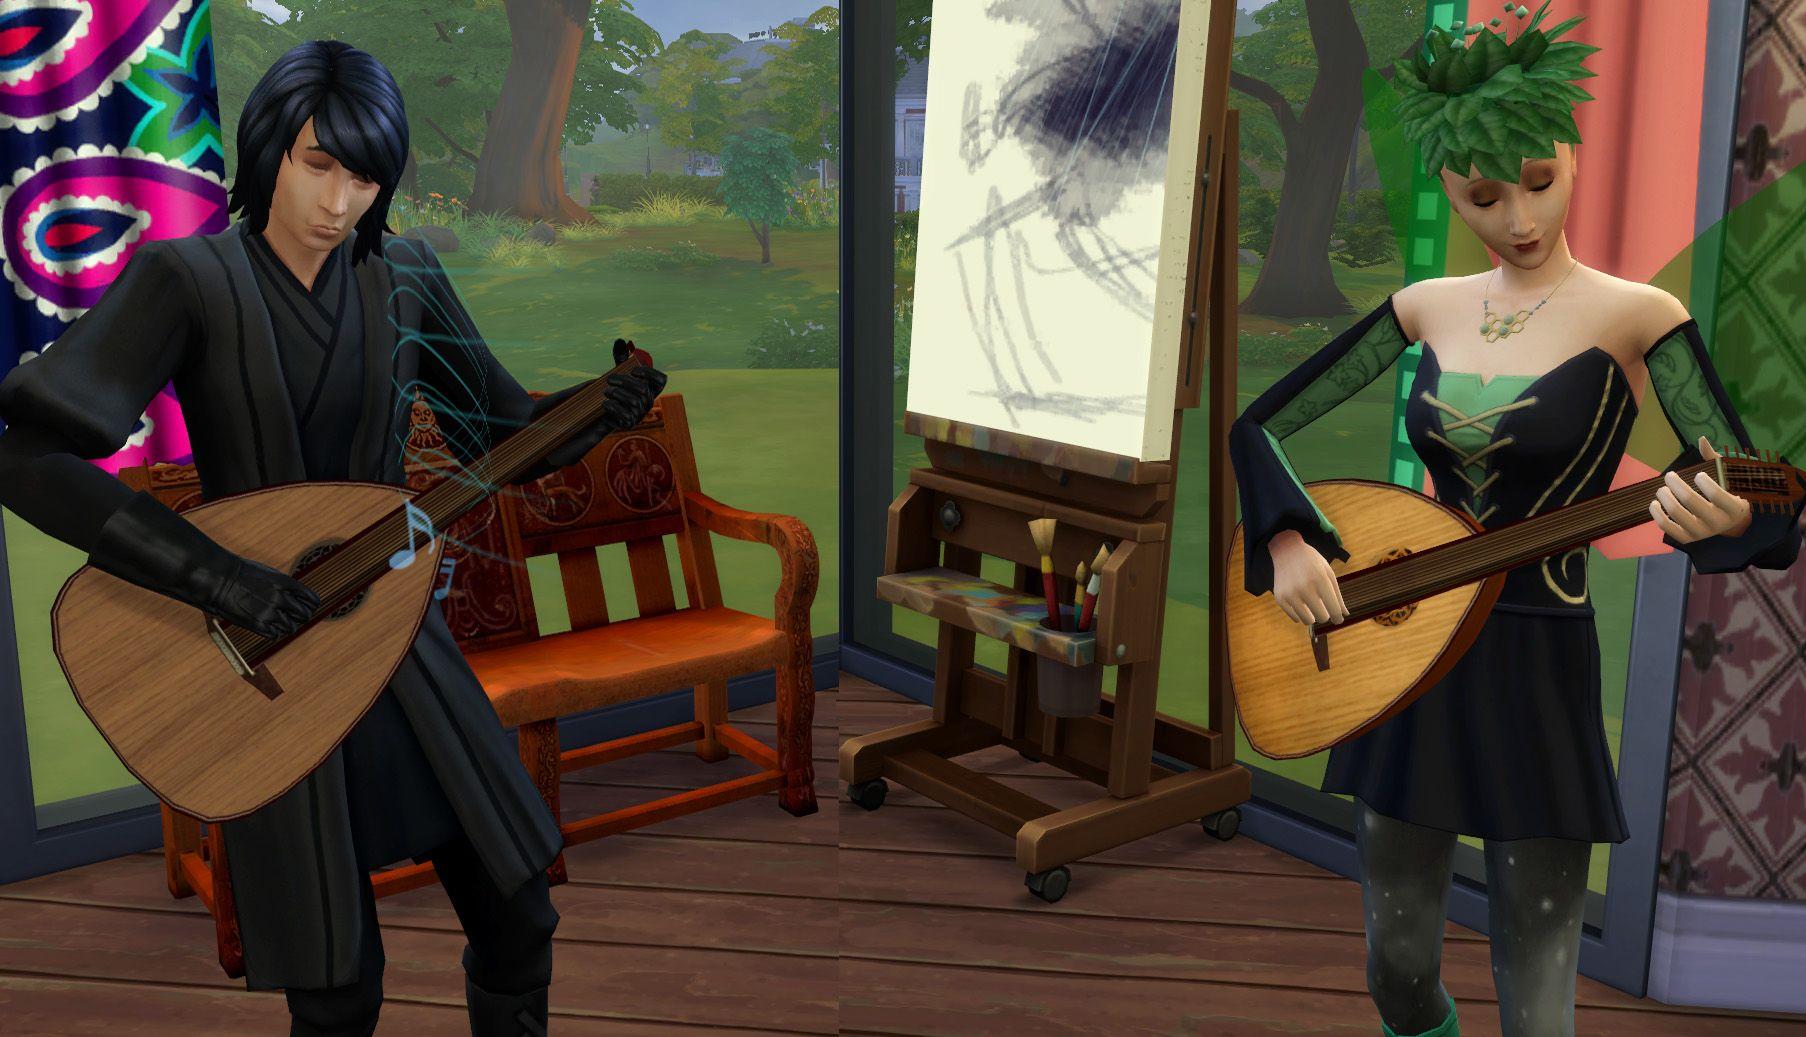 Mod The Sims Lute (Medieval/Renaissance Guitar) Sims